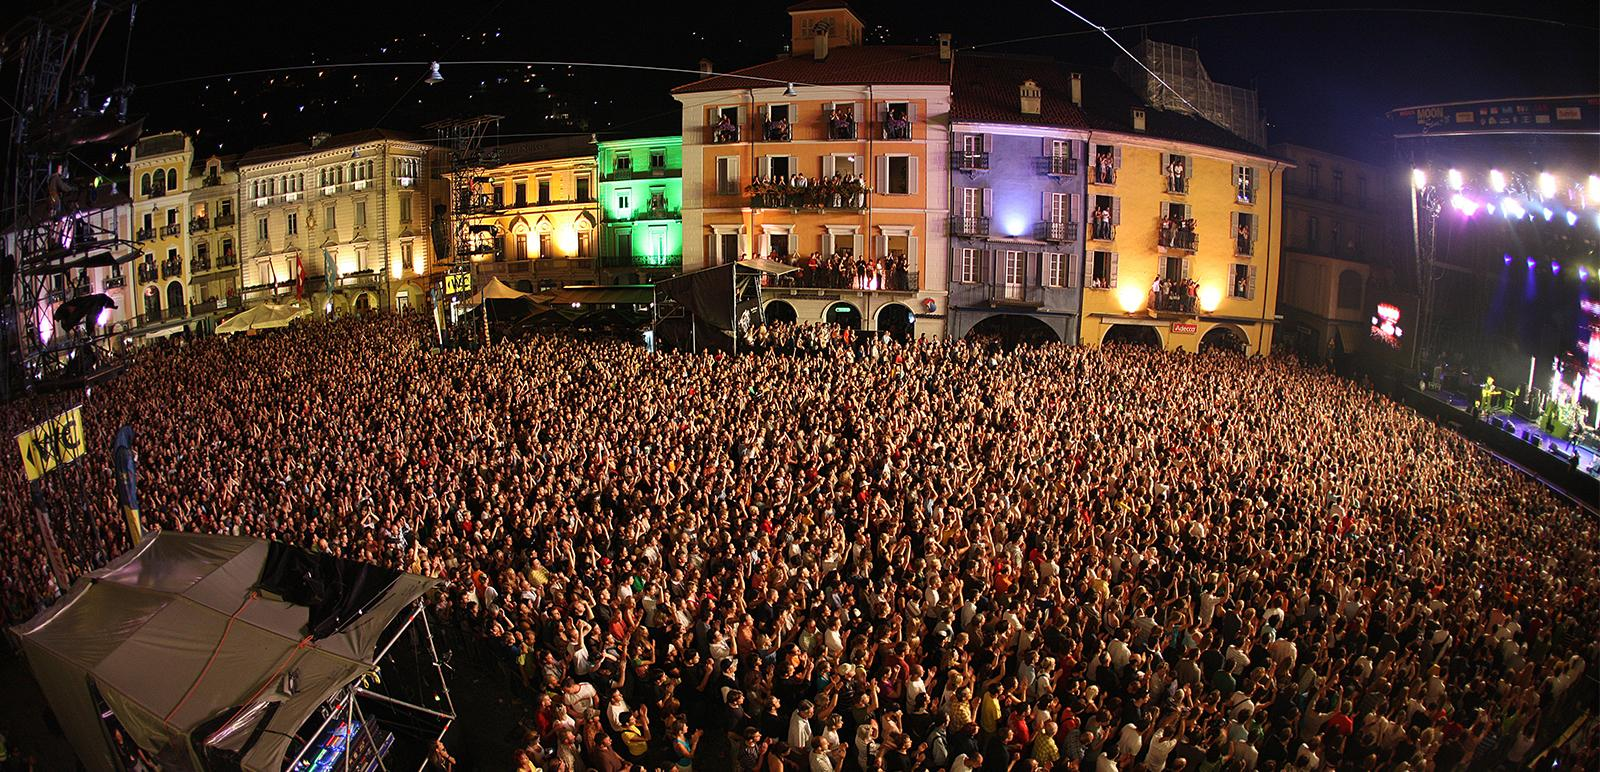 Menschenmenge beim Moon and Stars in Locarno